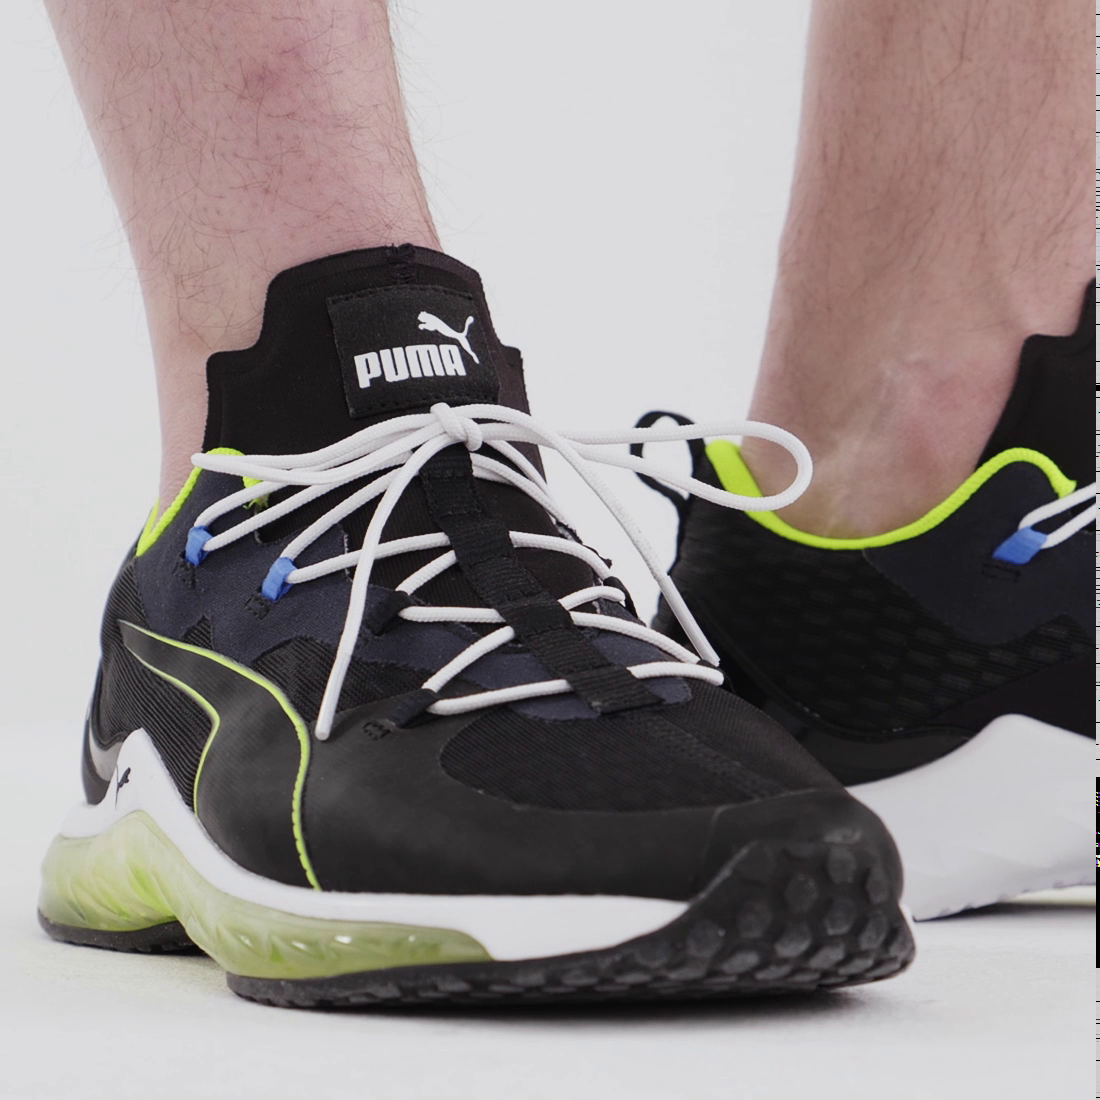 Image Puma LQDCELL Hydra Men's Training Shoes #8